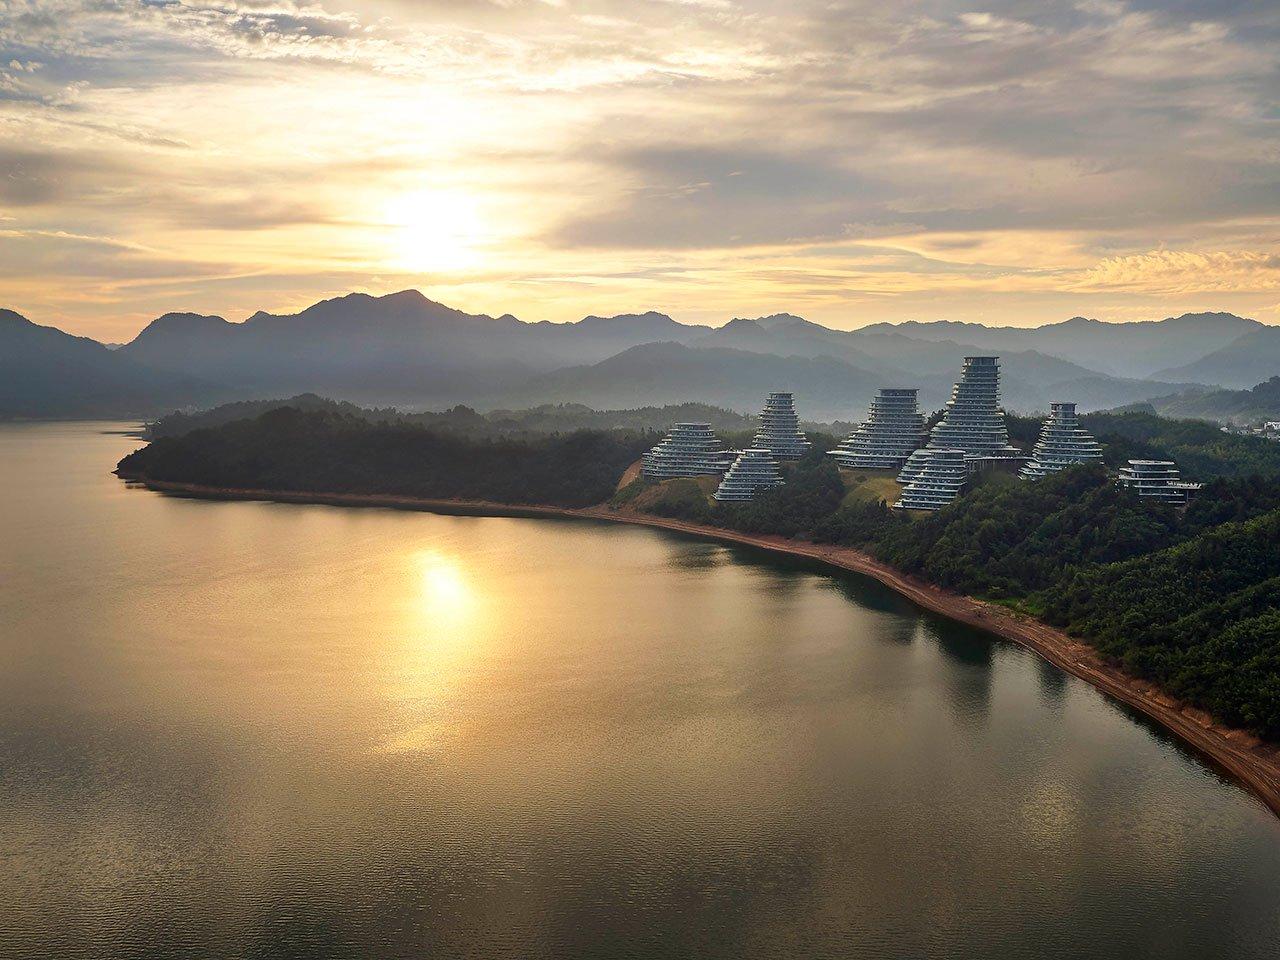 f13_mad_architects_huangshan_mountain_village_anhui_china_yatzer.jpg